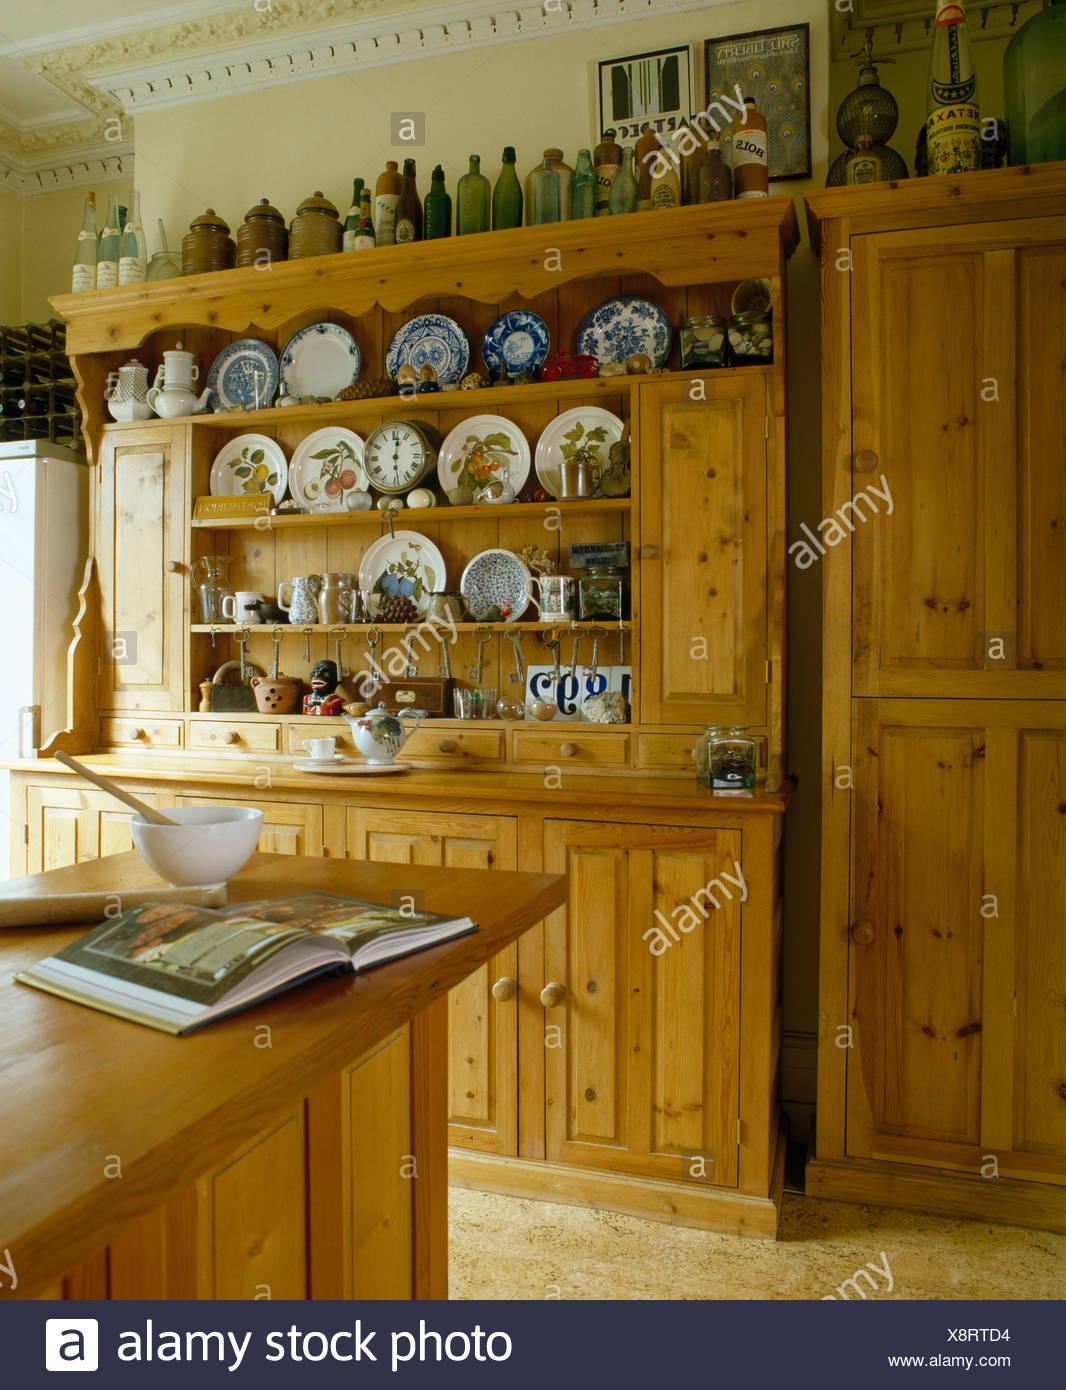 Kiefer Kommode in traditionelle Küche Stockfoto, Bild: 280807216 - Alamy